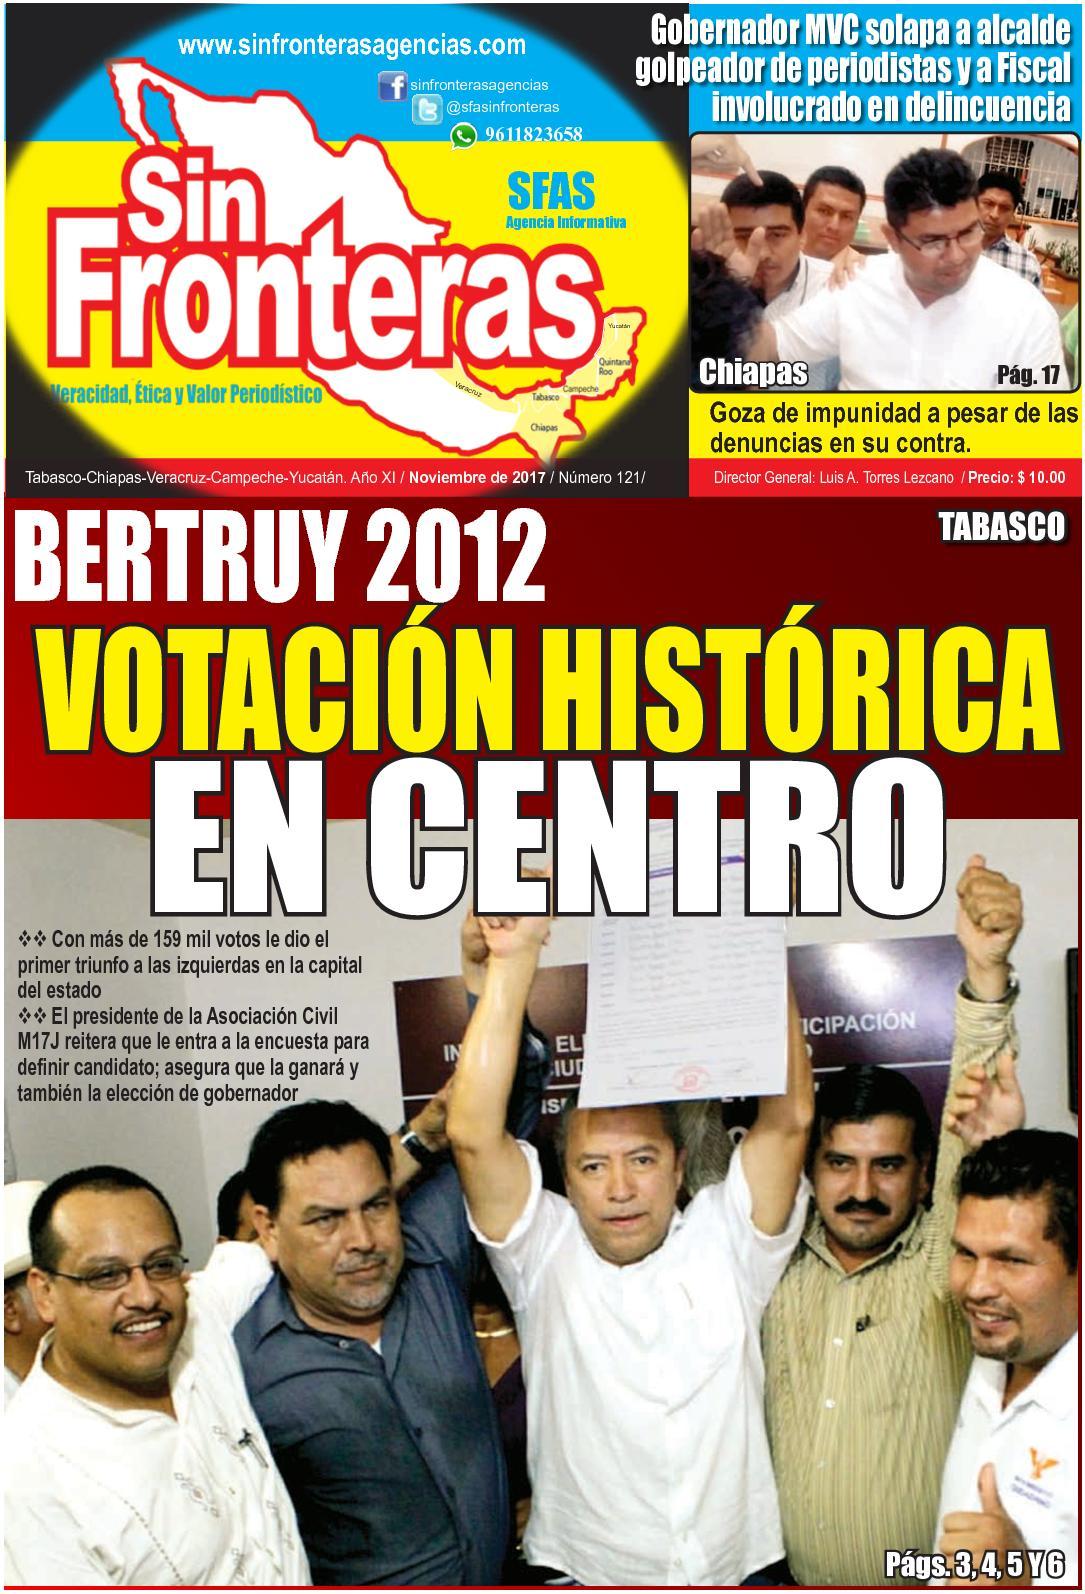 SIN FRONTERAS: TABASCO, VERACRUZ, CHIAPAS